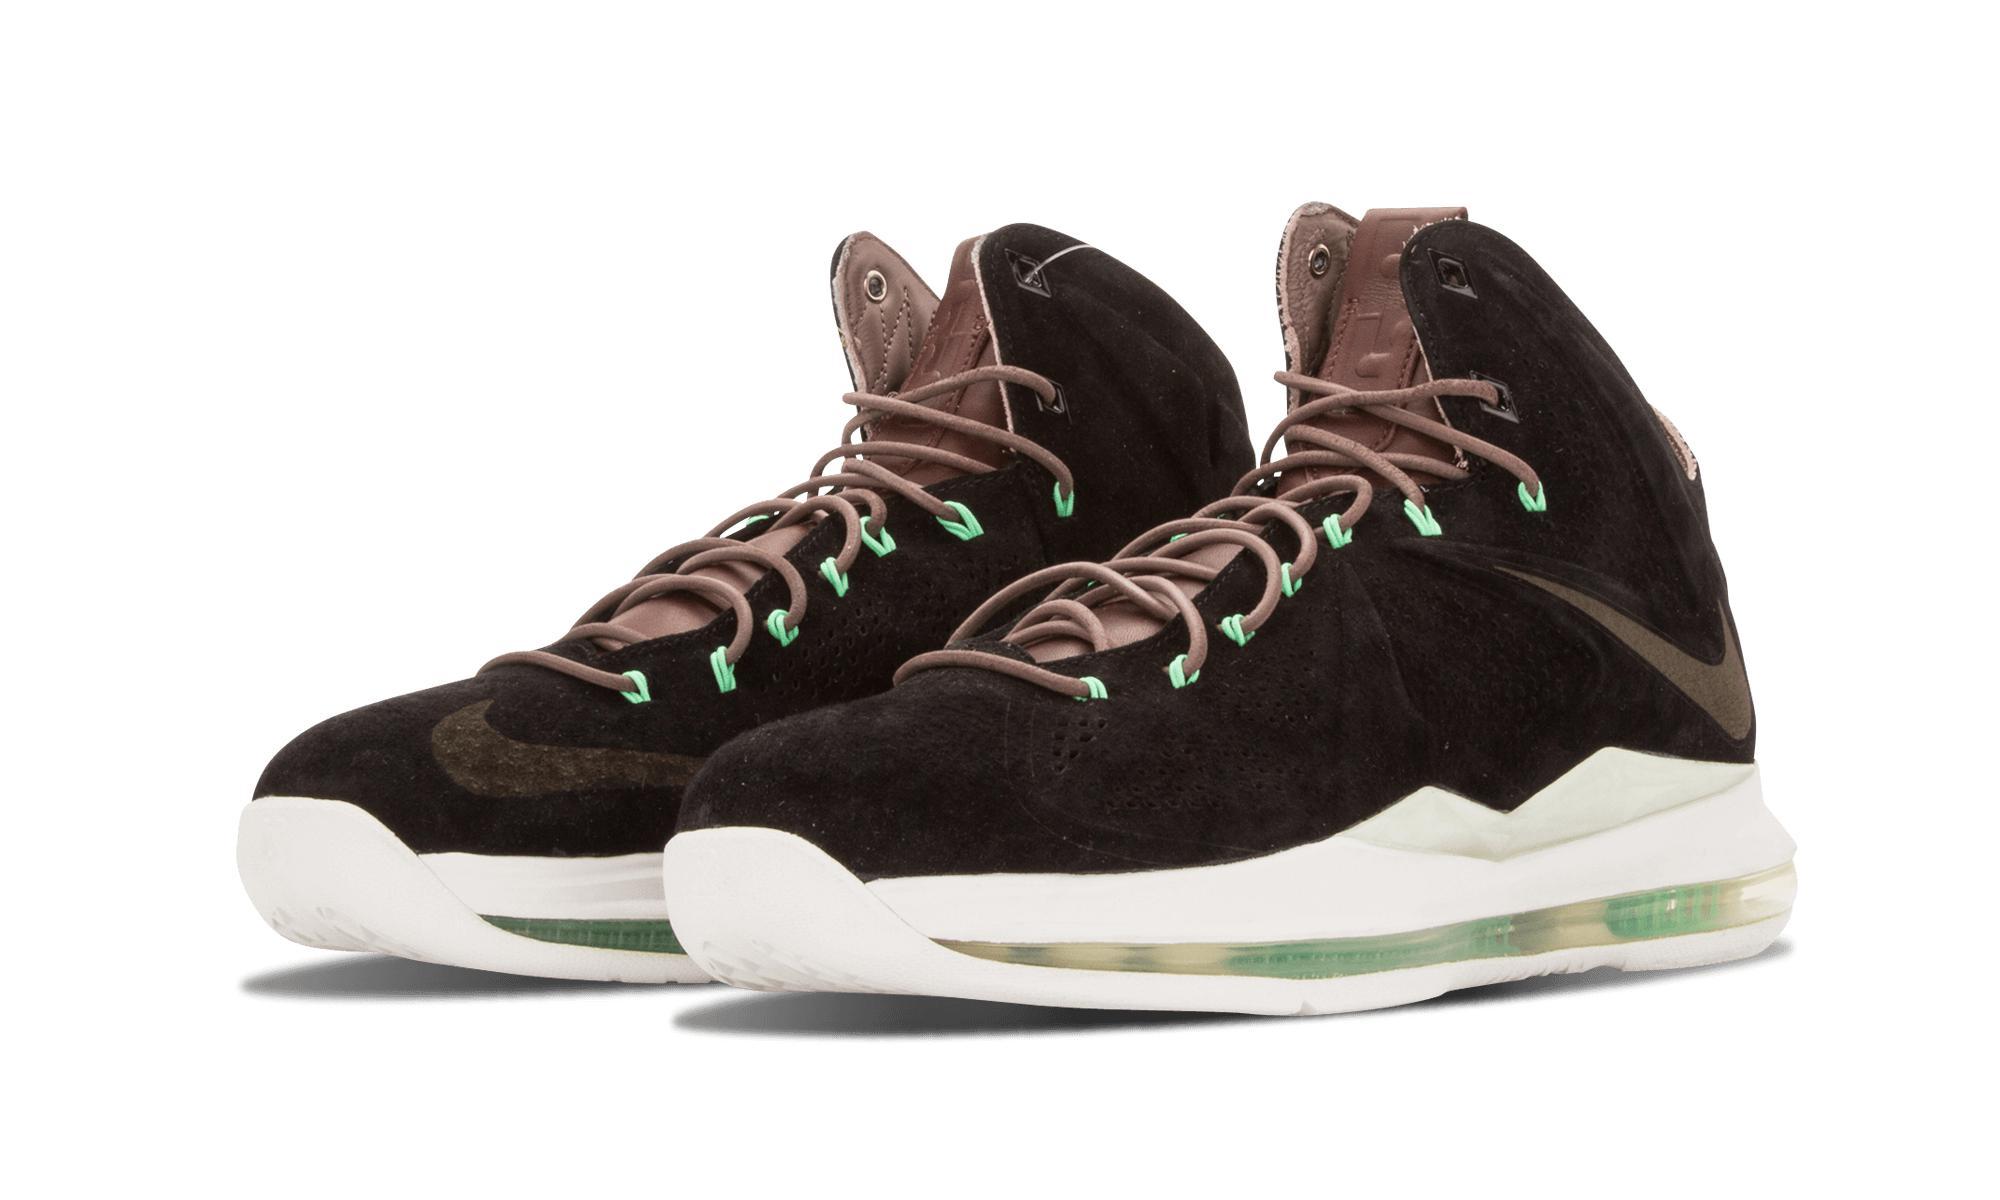 wholesale dealer d817d f0686 Lyst - Nike Lebron 10 Ext Qs in Black for Men